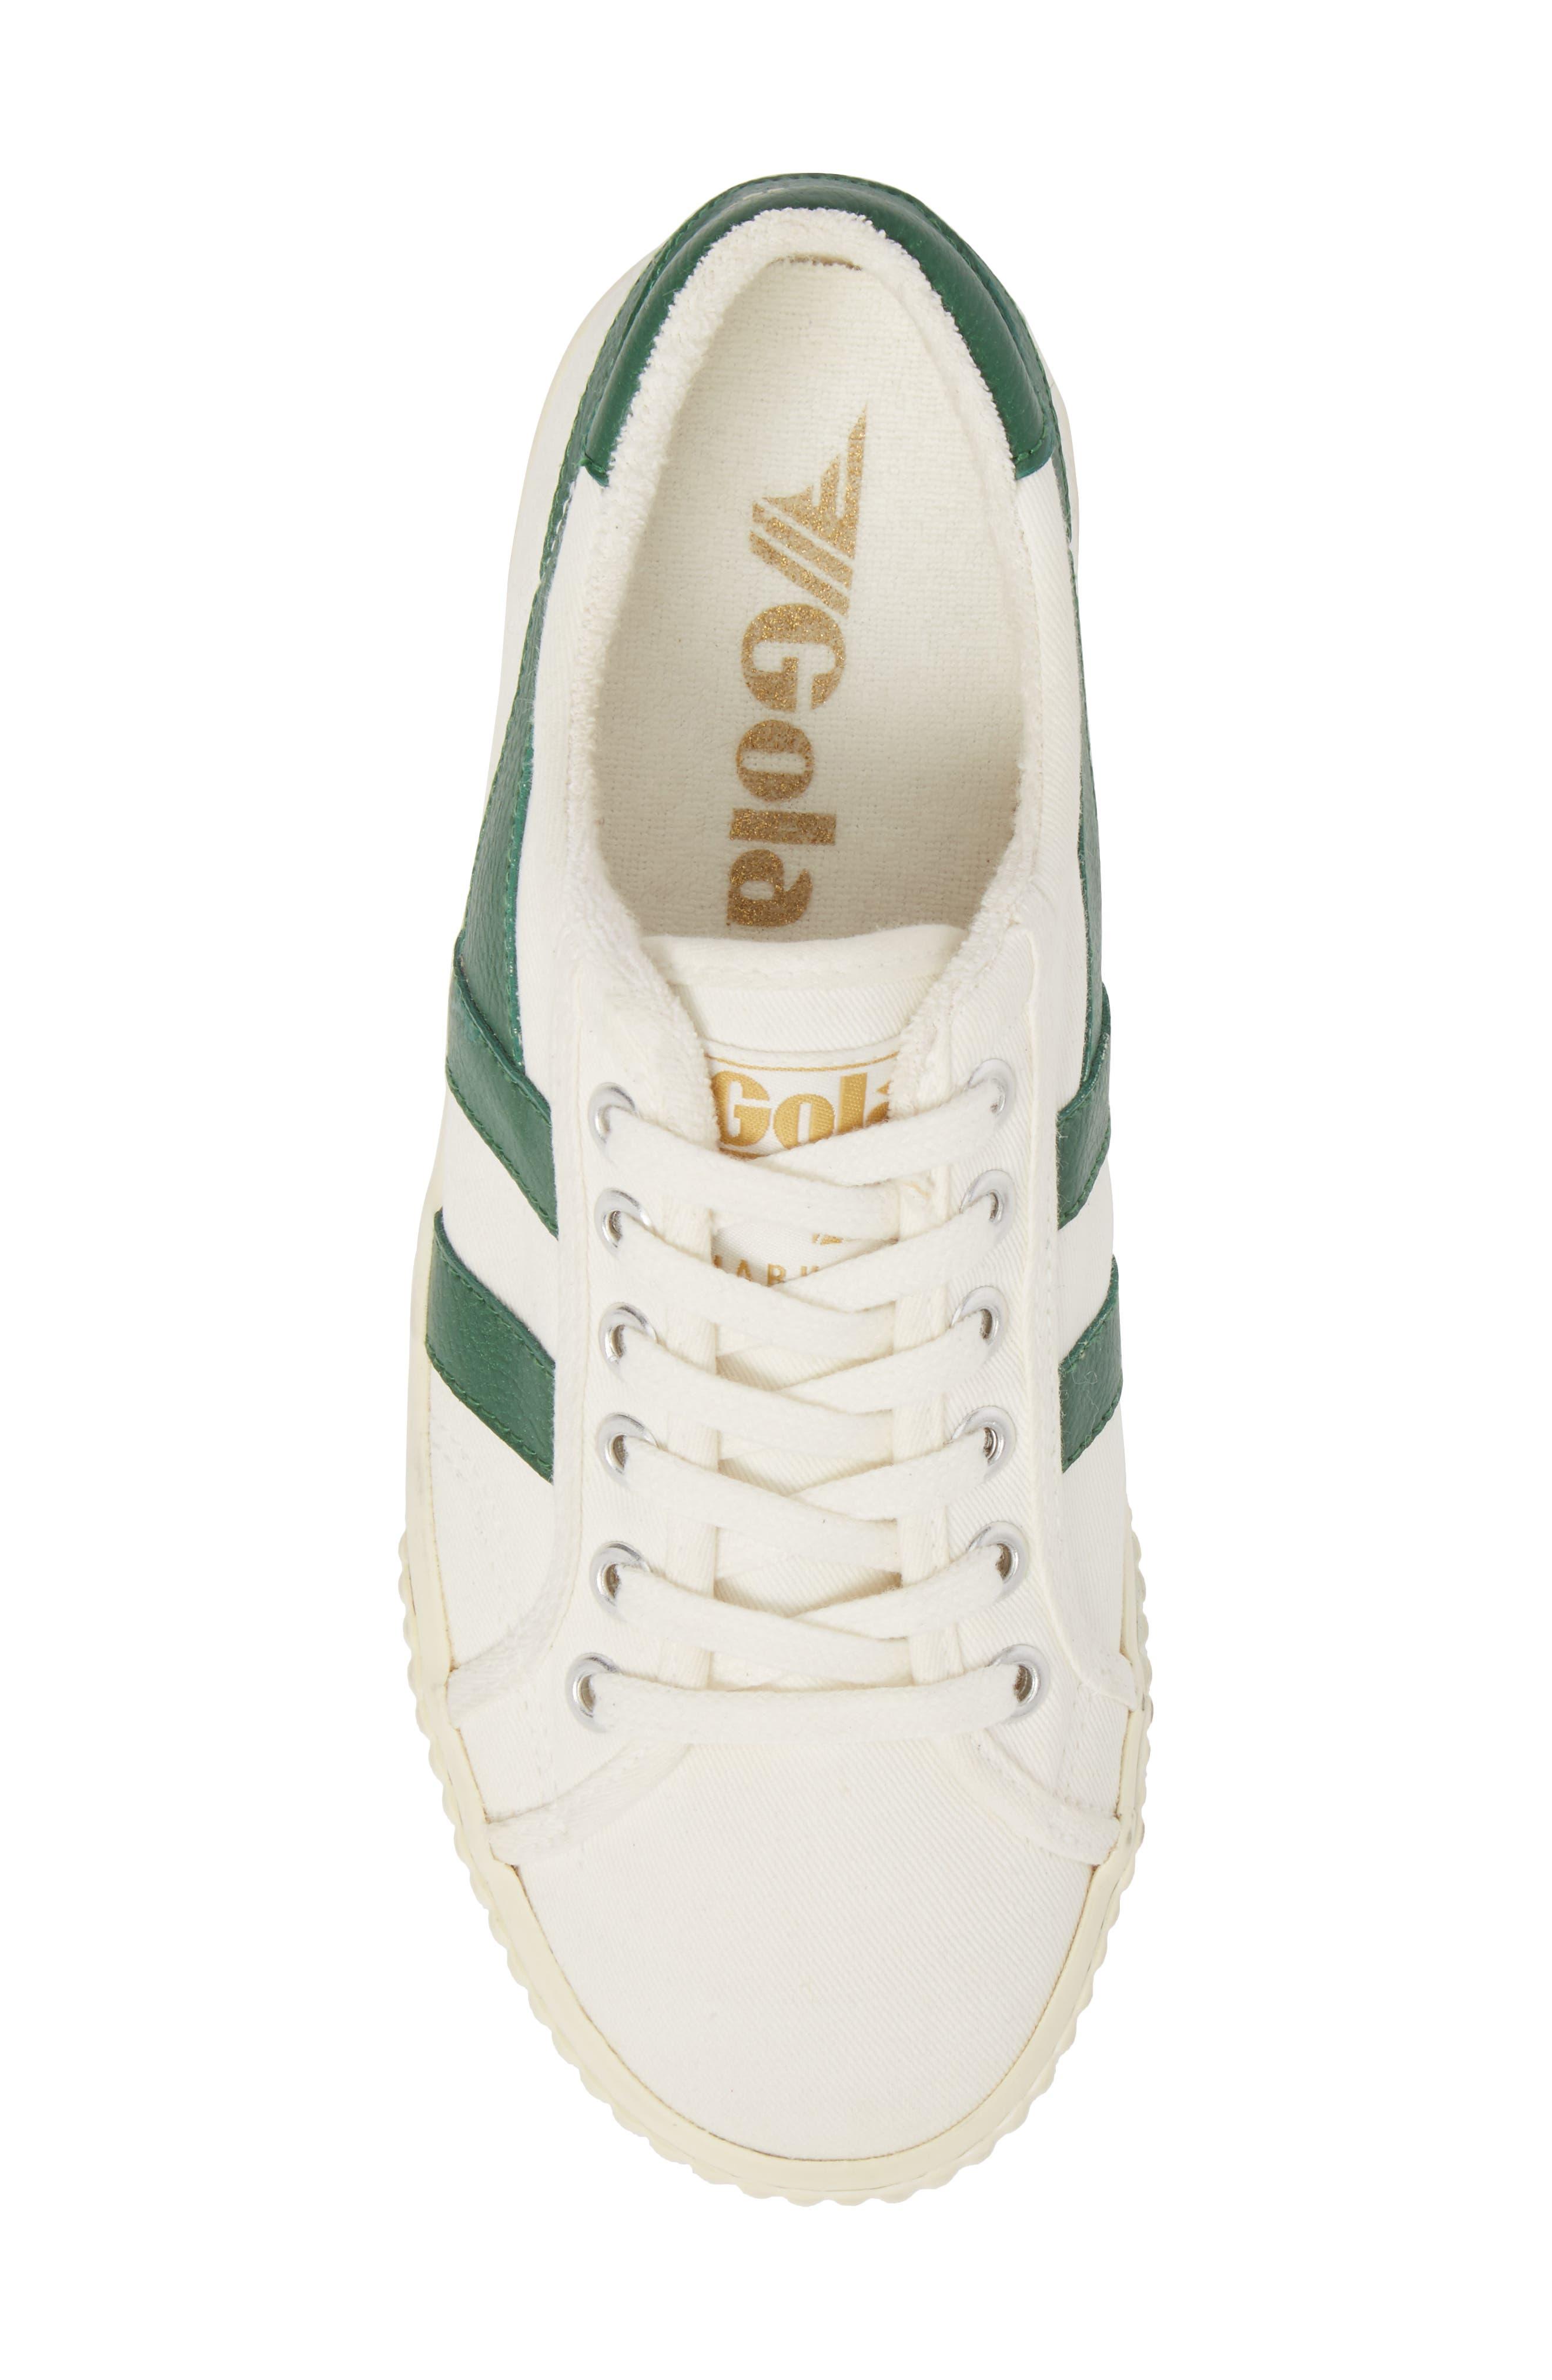 Tennis Mark Cox Sneaker,                             Alternate thumbnail 5, color,                             Off White/ Green